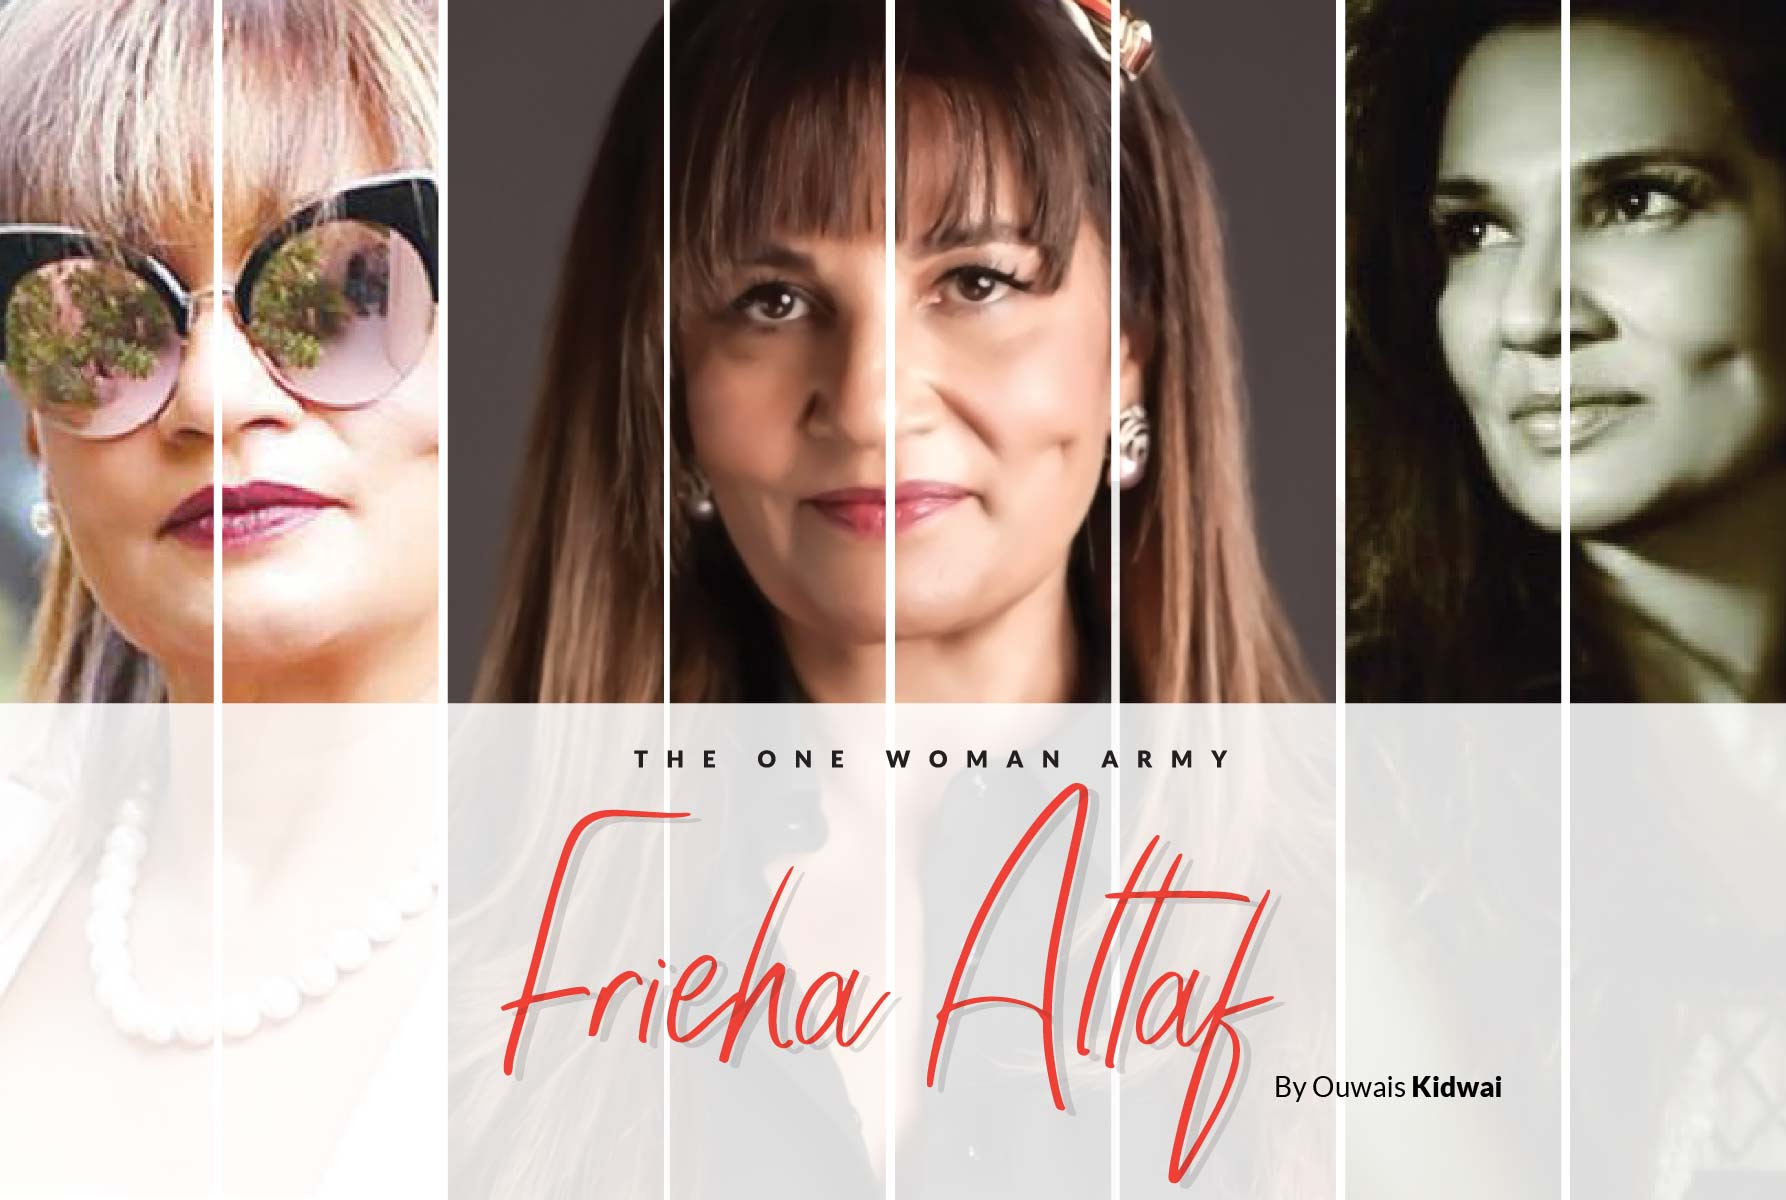 Pakistan's top fashion mogul Frieha_Altaf